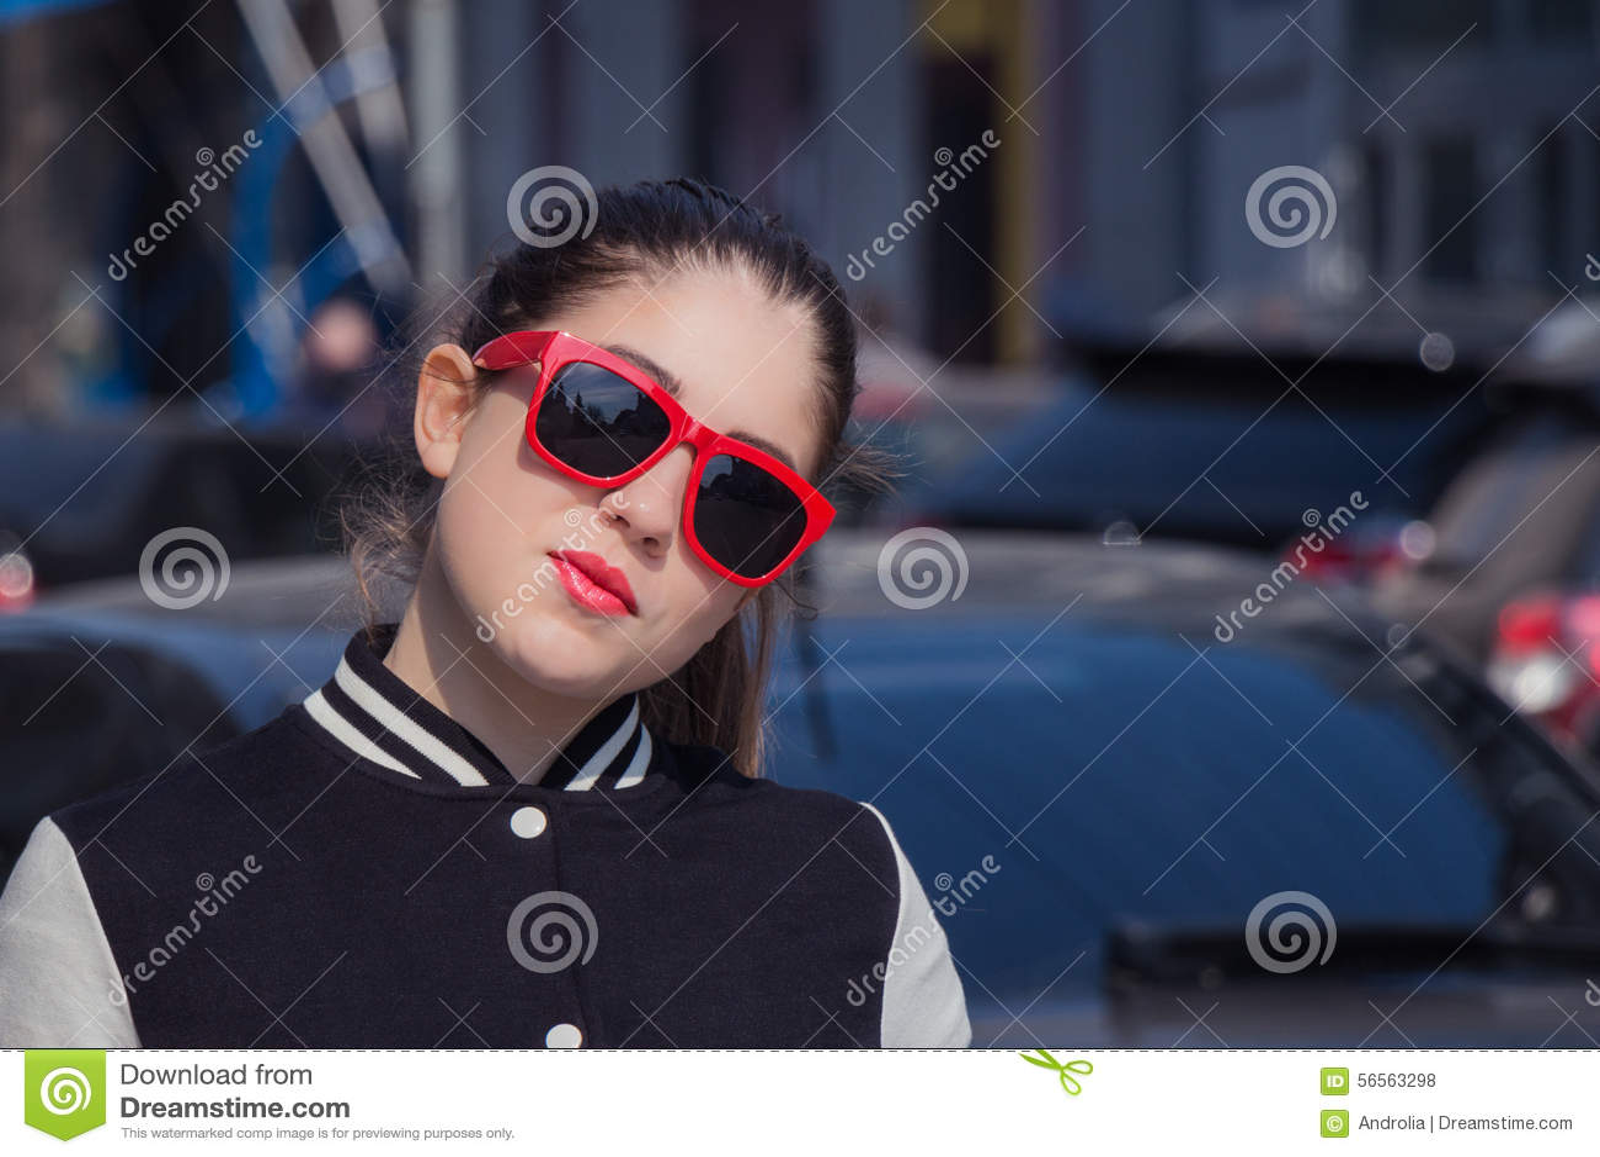 Download Στενός επάνω πορτρέτου ενός μοντέρνου κοριτσιού στα κόκκινα γυαλιά ηλίου Στοκ Εικόνες - εικόνα από εξαρτημάτων, μαύρα: 56563298